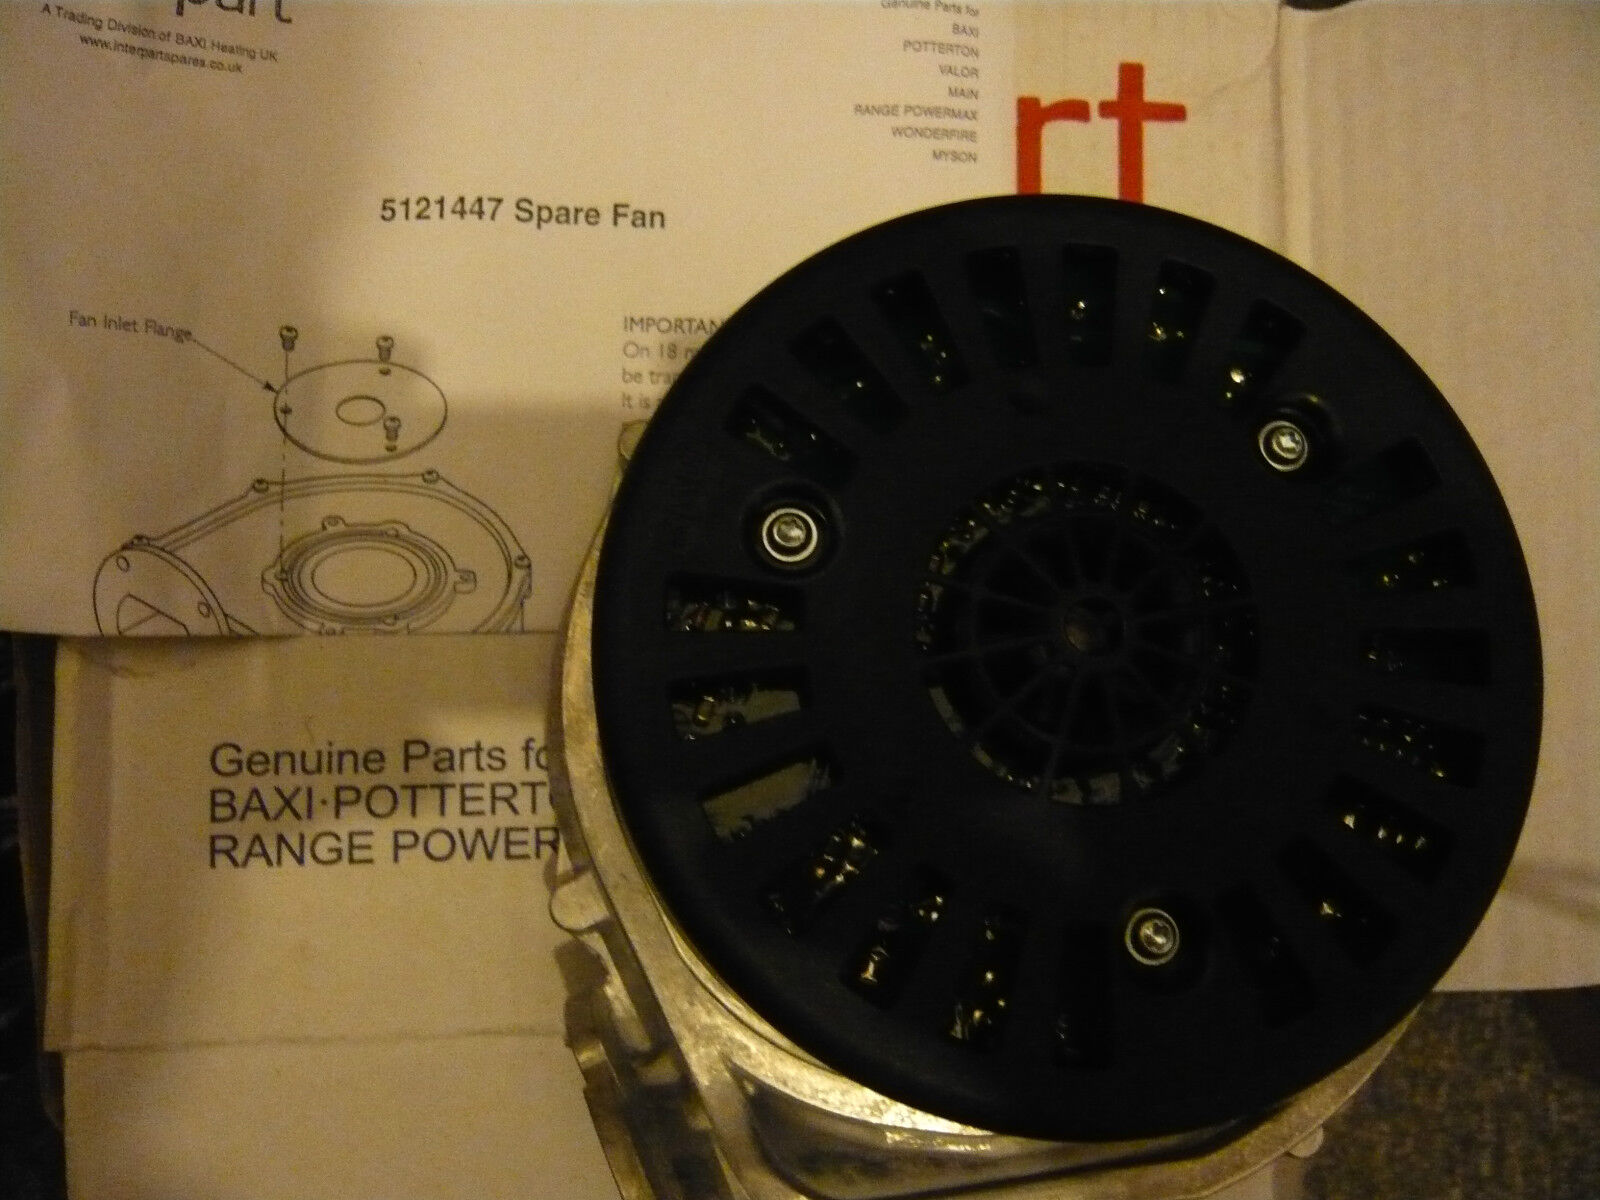 Potterton Promax or & Baxi Duotec platine 24HE, 28HE, 33HE, 40HE Ventilateur 5121447